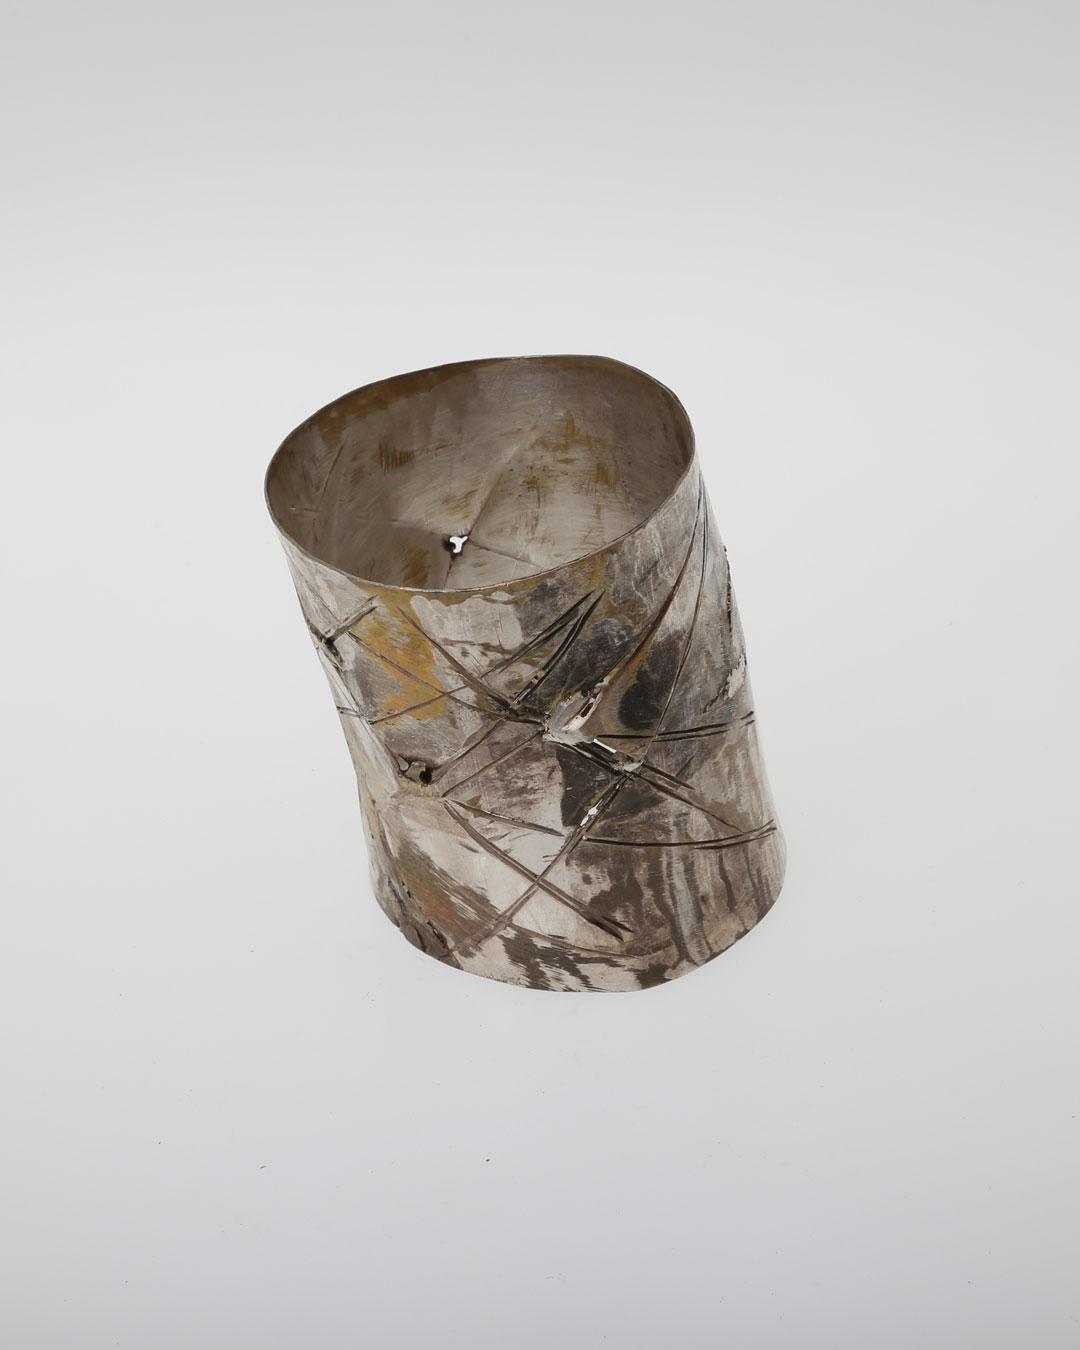 Rudolf Kocéa, Stars, 2017, bracelet; silver, copper, gold, ø 66 mm, €2225